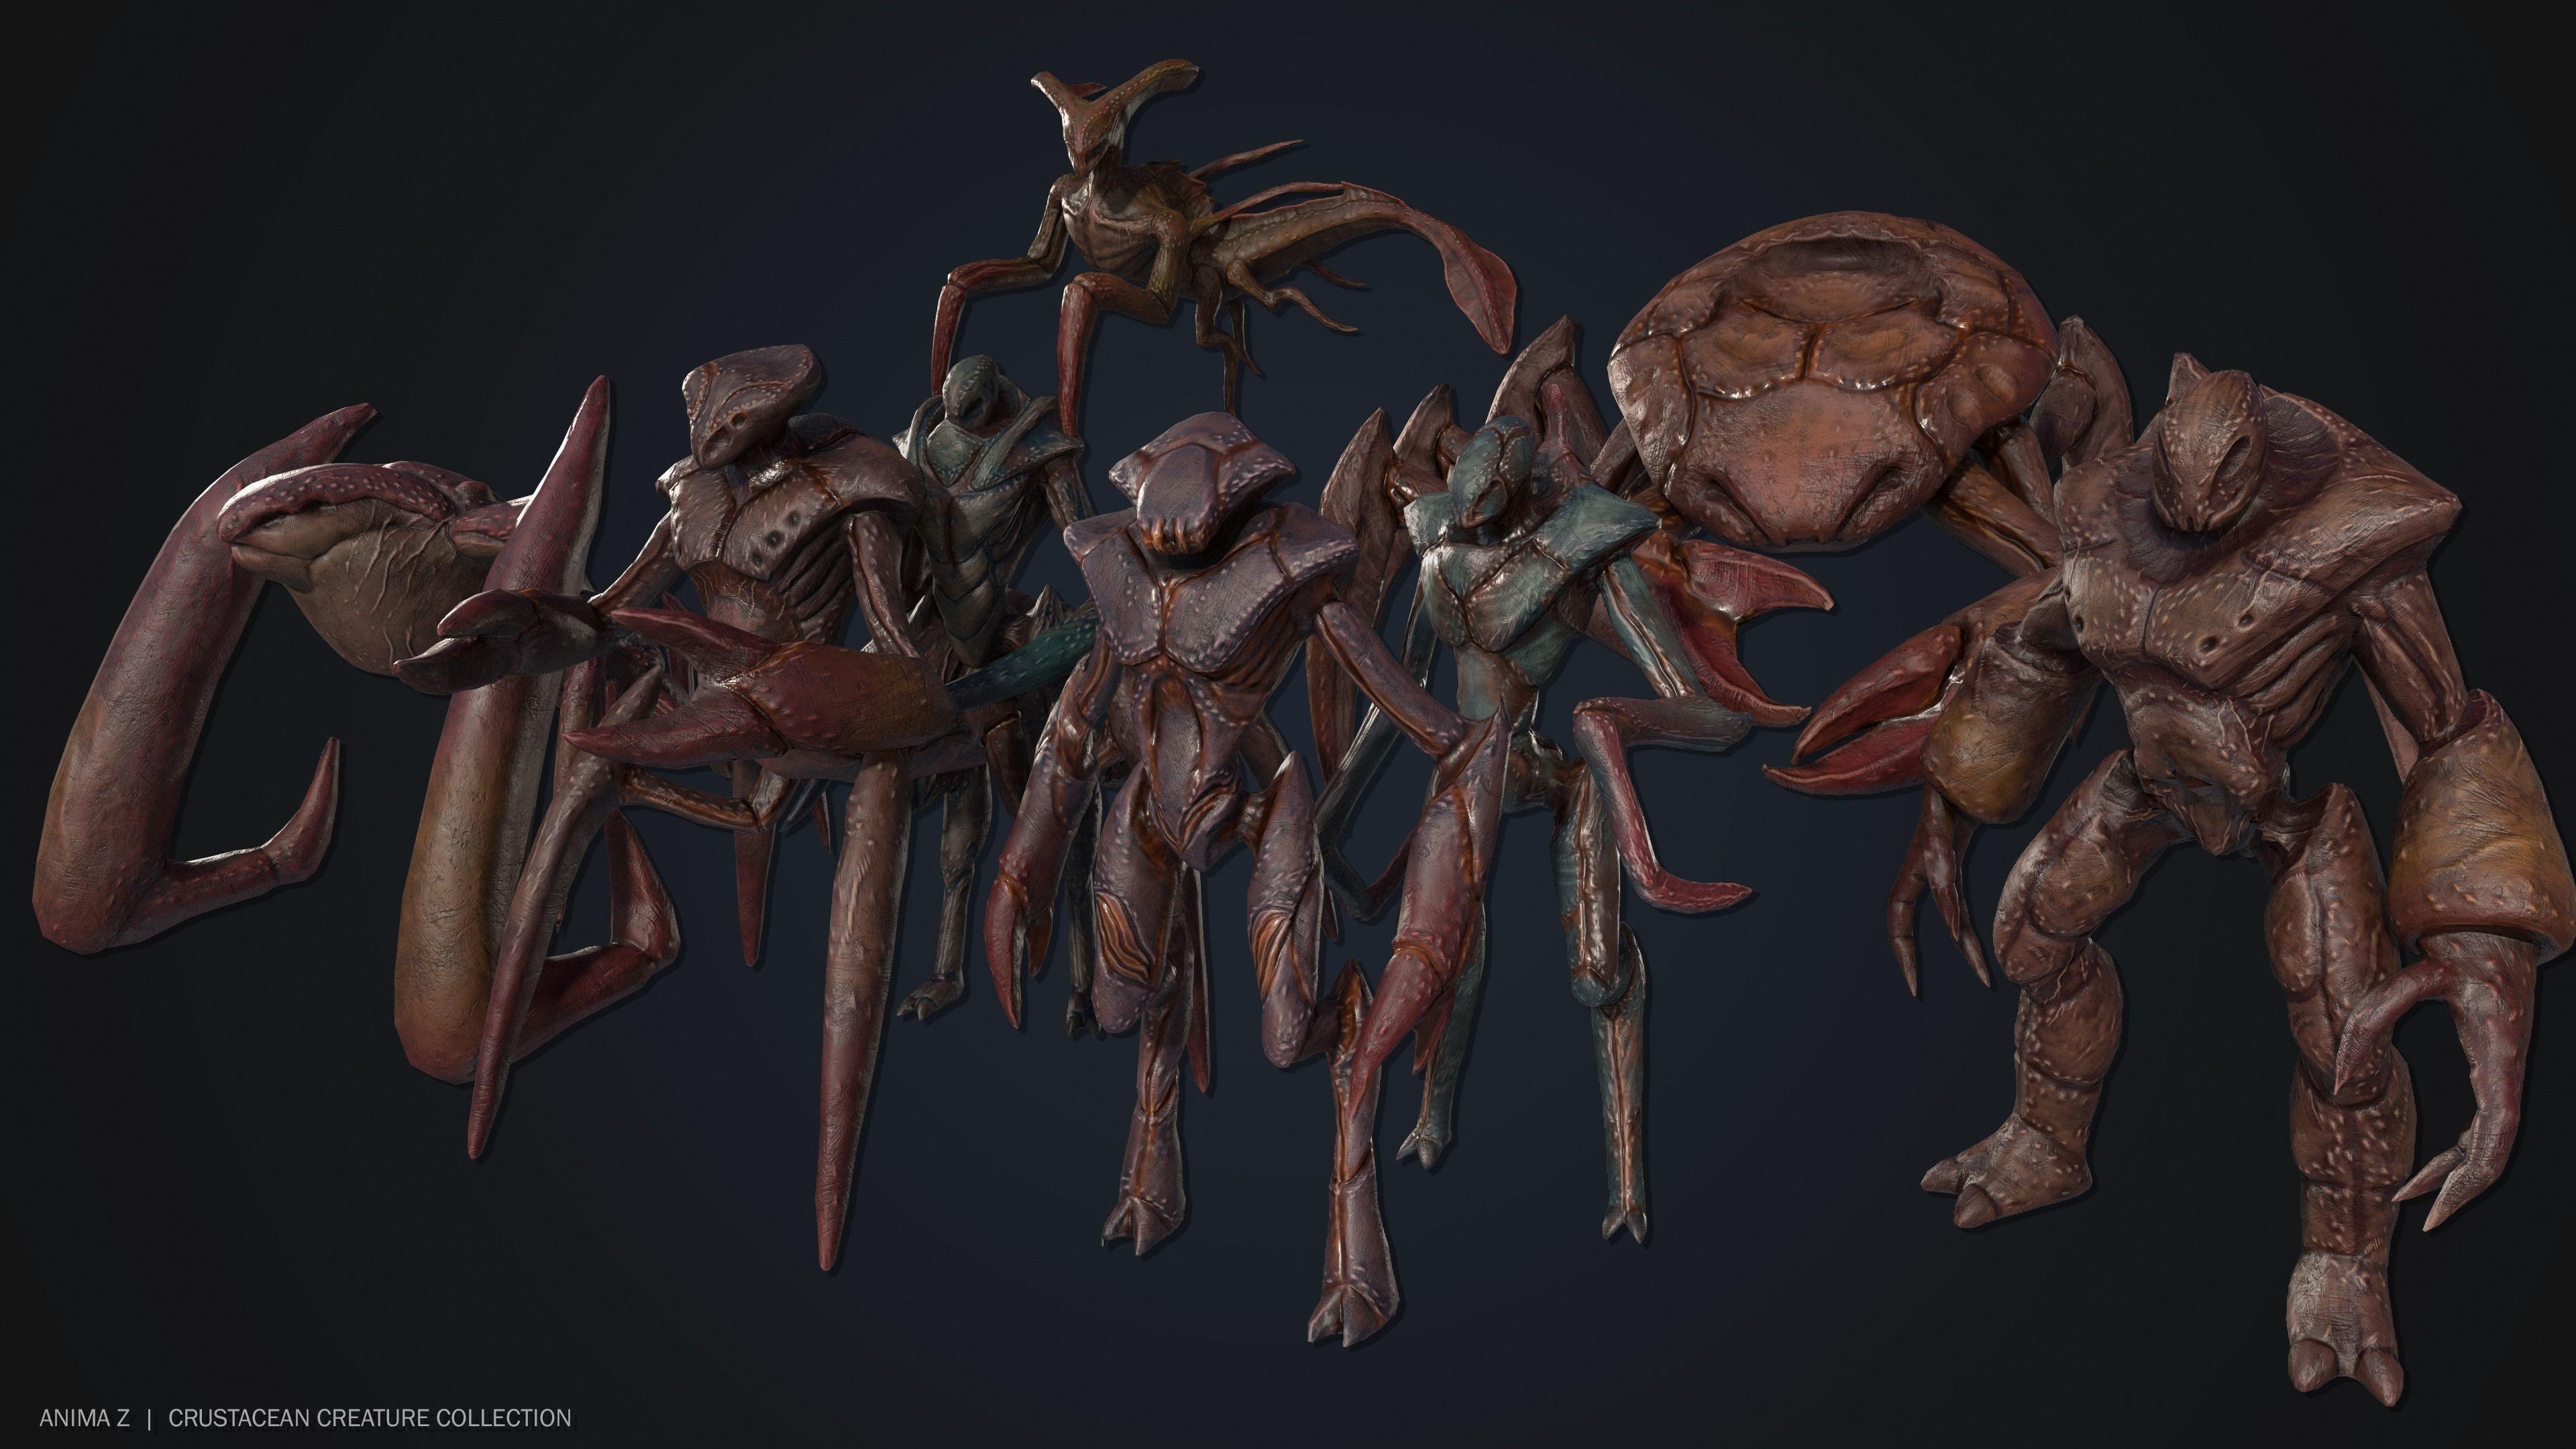 Crustacean creature collection